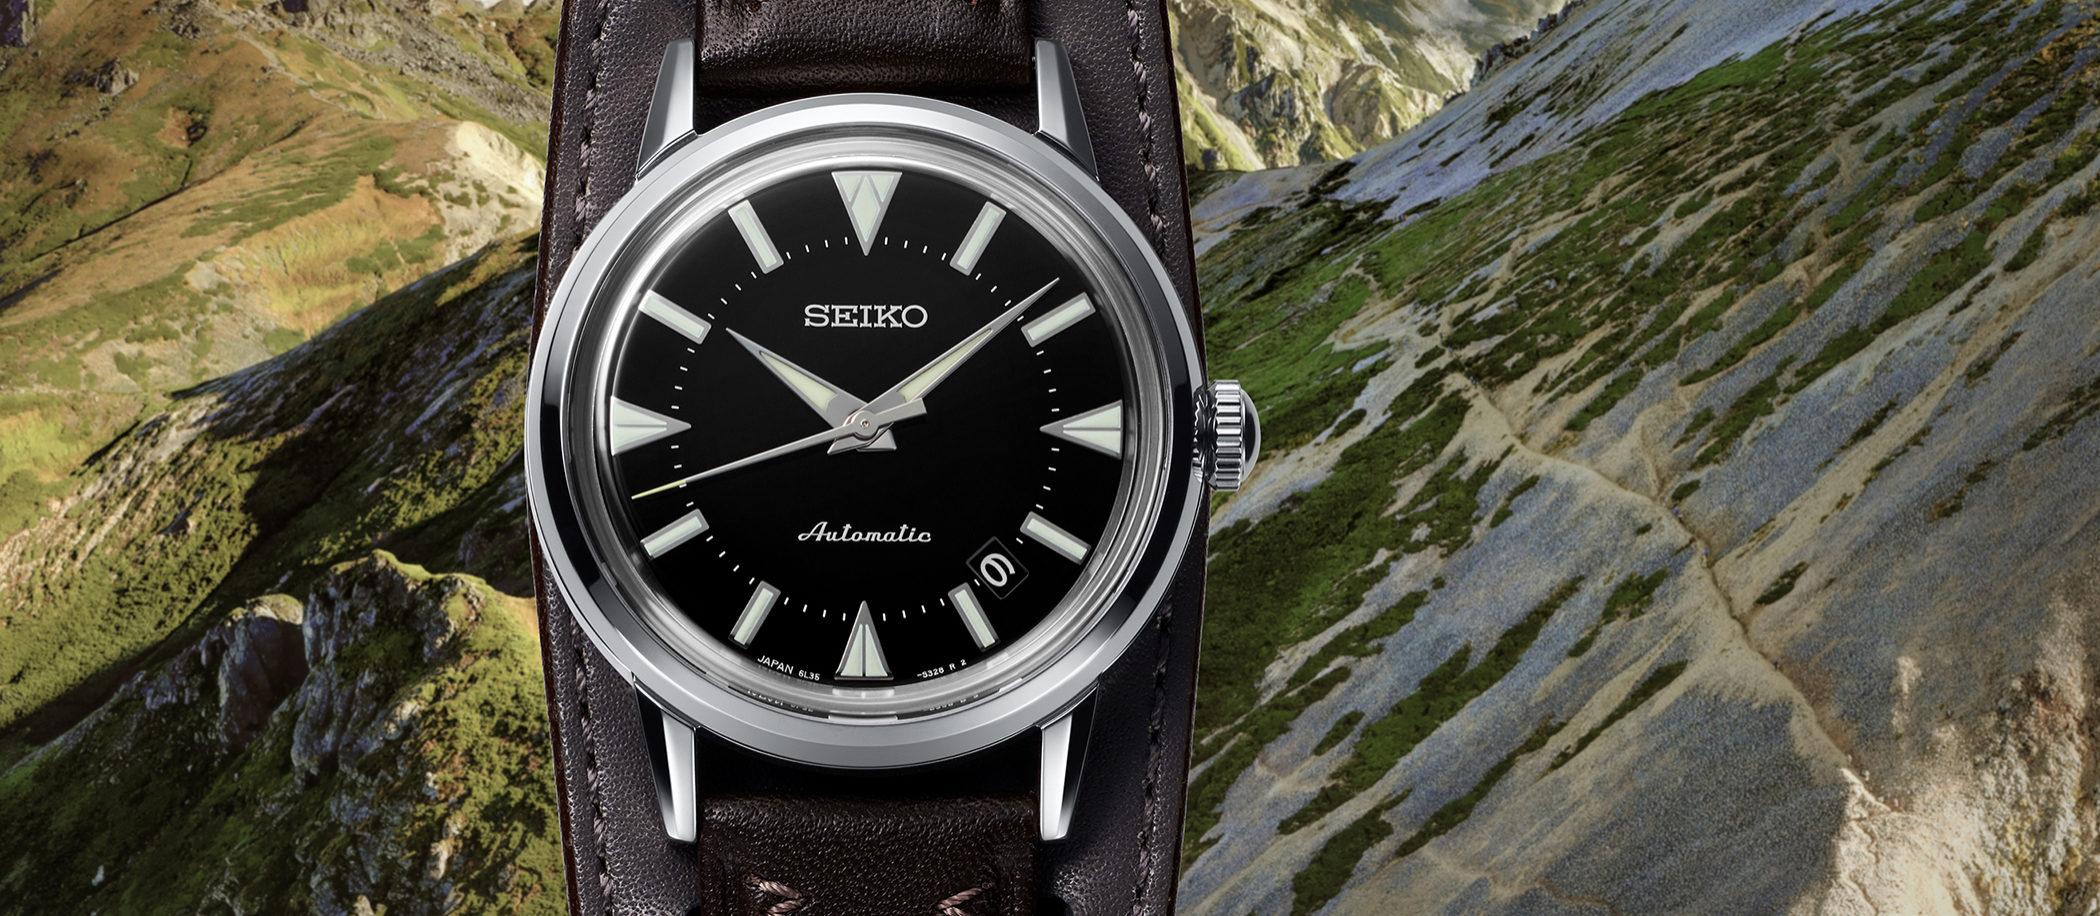 Seiko Prospex The 1959 Alpinist Re-creation